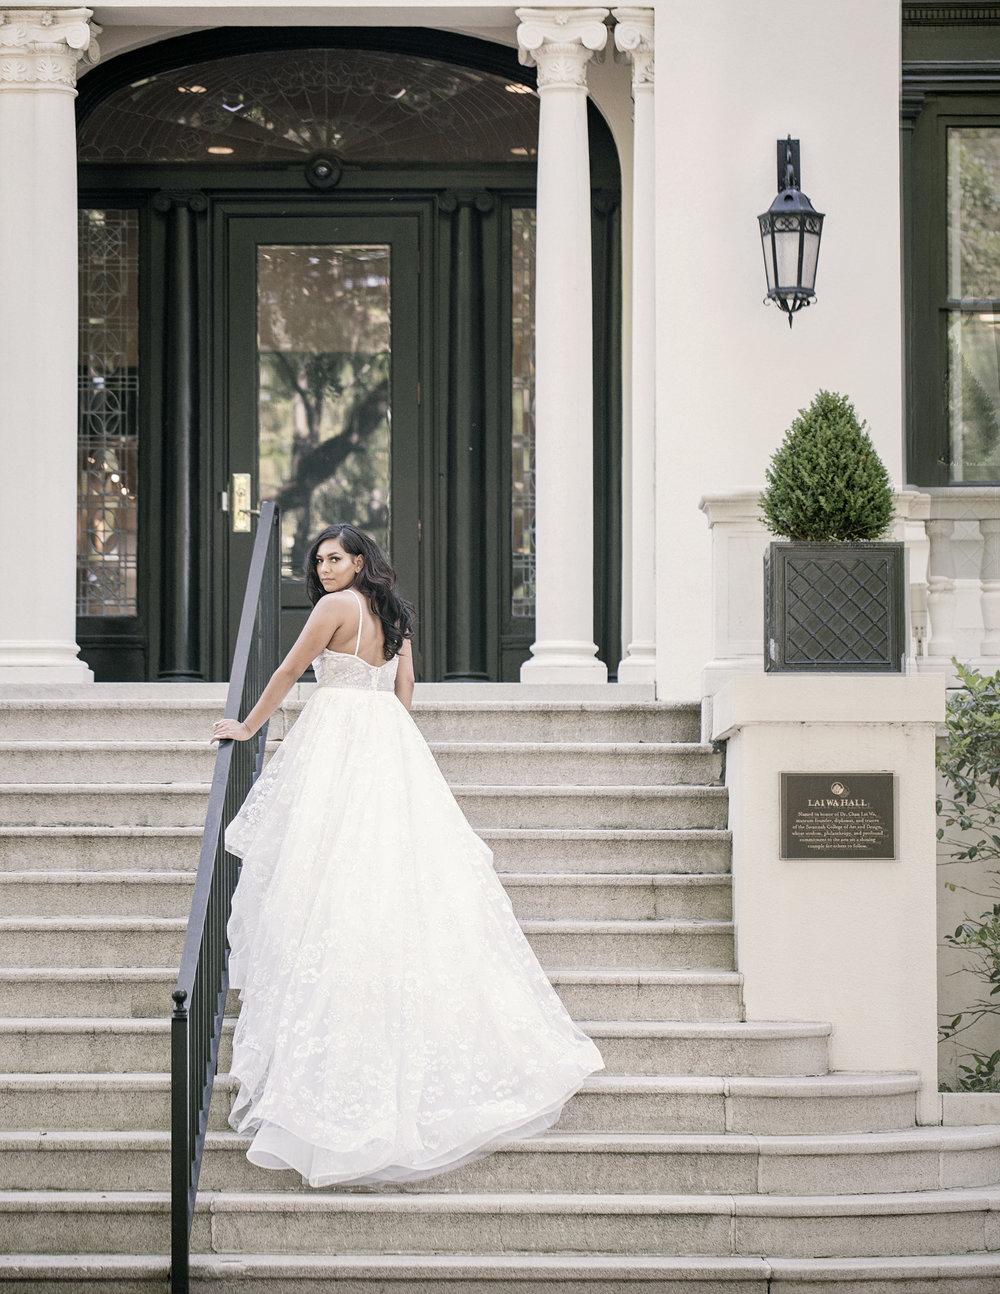 savannah-bridal-shop-unexpected-joys-of-wedding-planning-savannah-wedding-planning-gina-vogel-photography-savannah-weddings-9.jpg